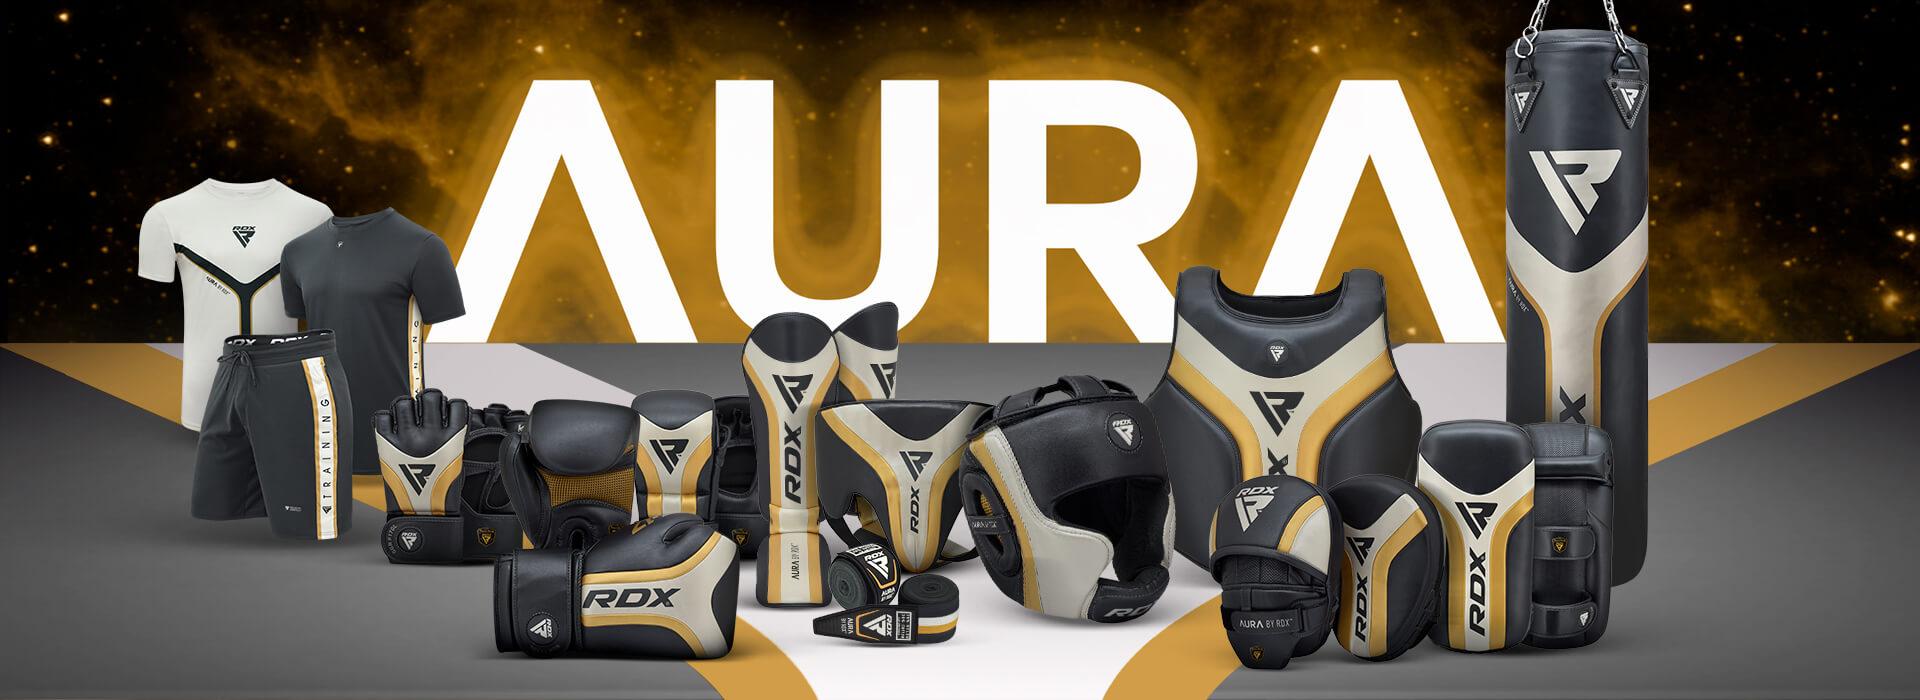 RDXSports Aura